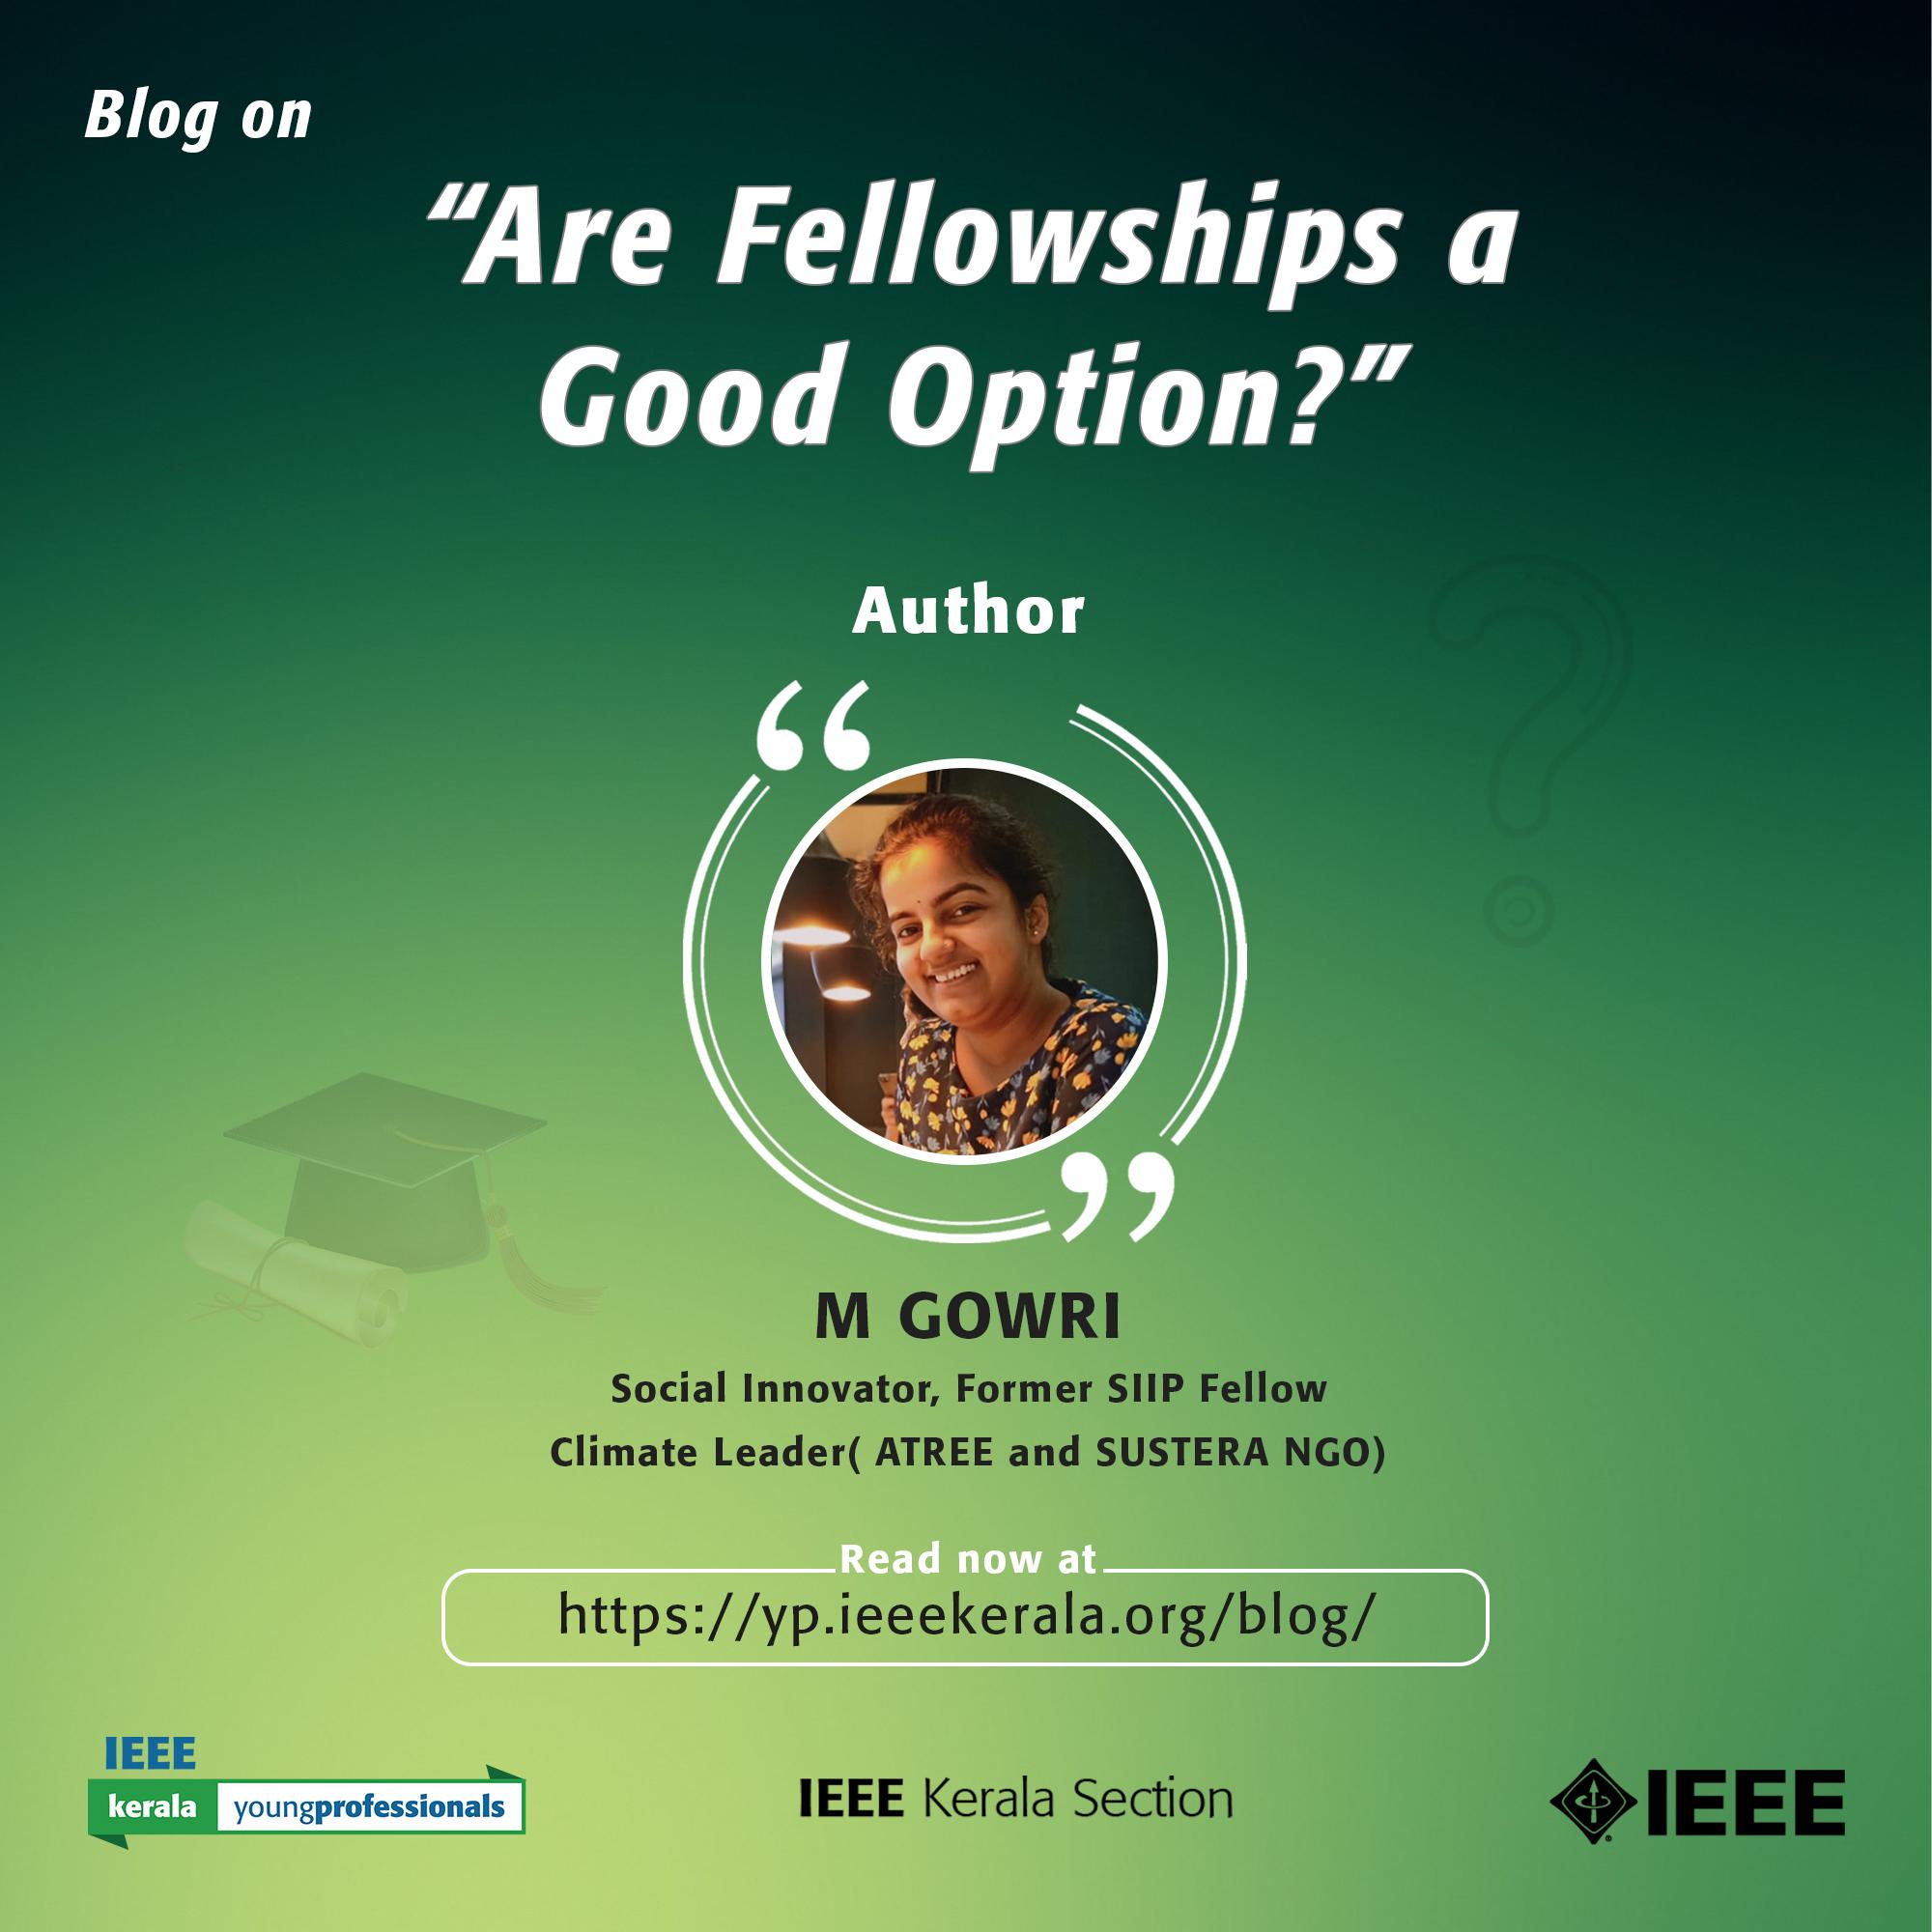 Are Fellowships A Good Option?